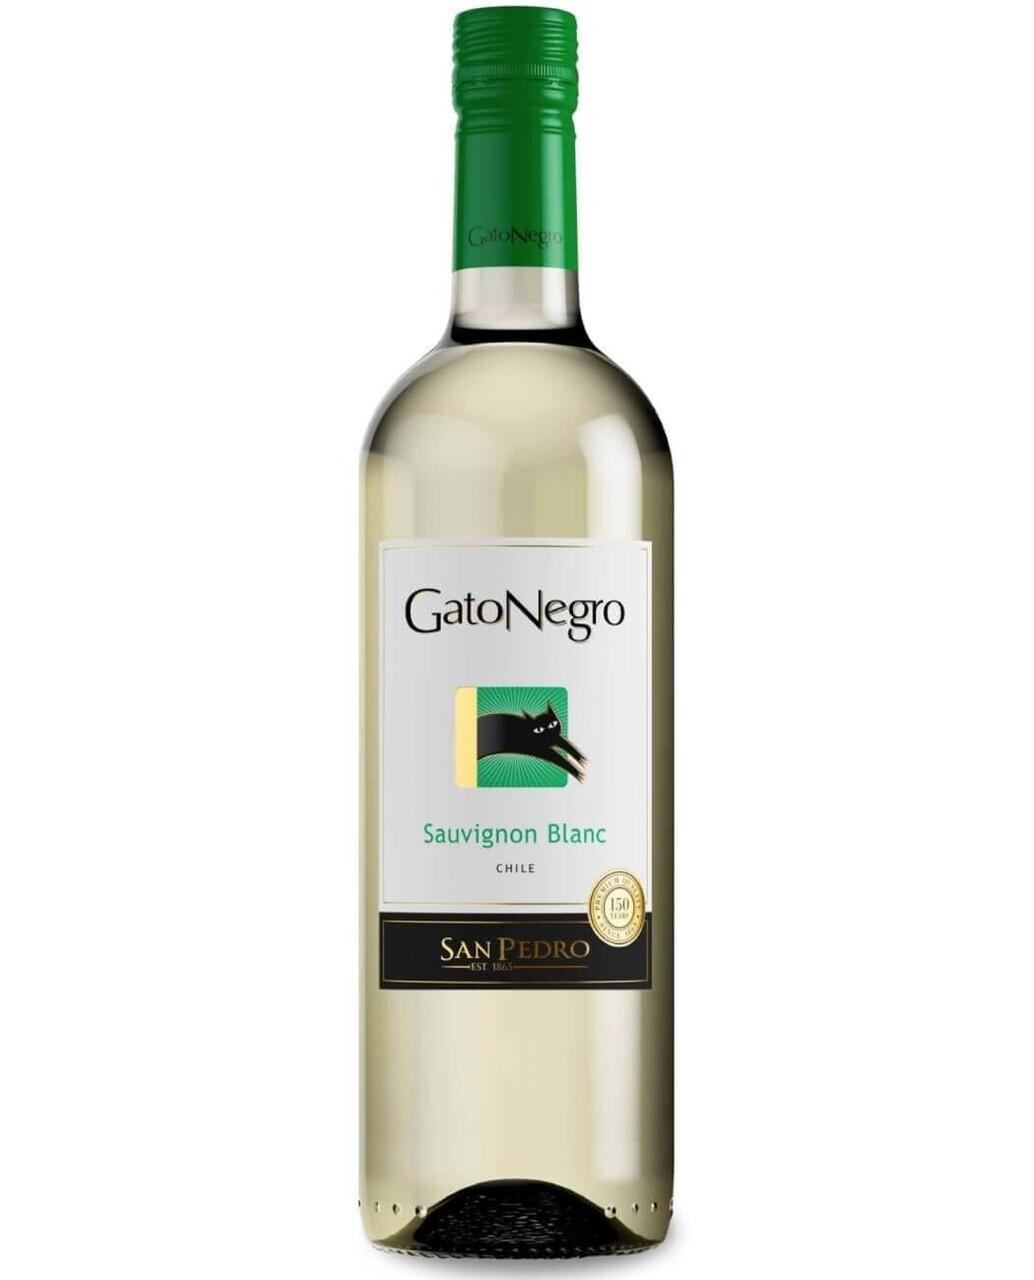 San Pedro Gato Negro Sauvignon Blanc